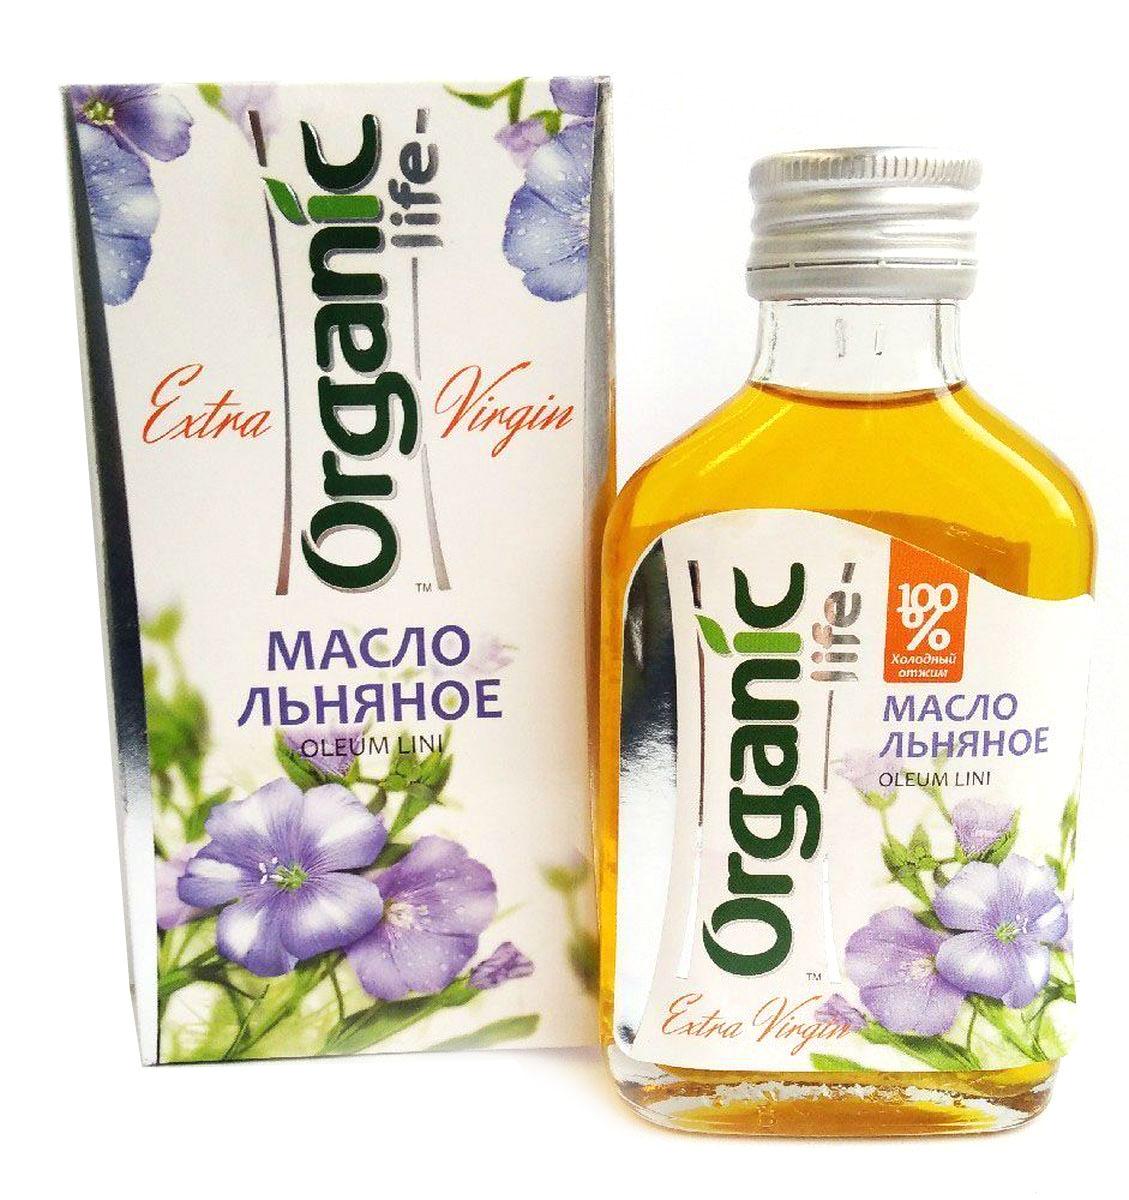 Organic Life масло льняное, 100 мл масло льняное полимерезиновое lefranc